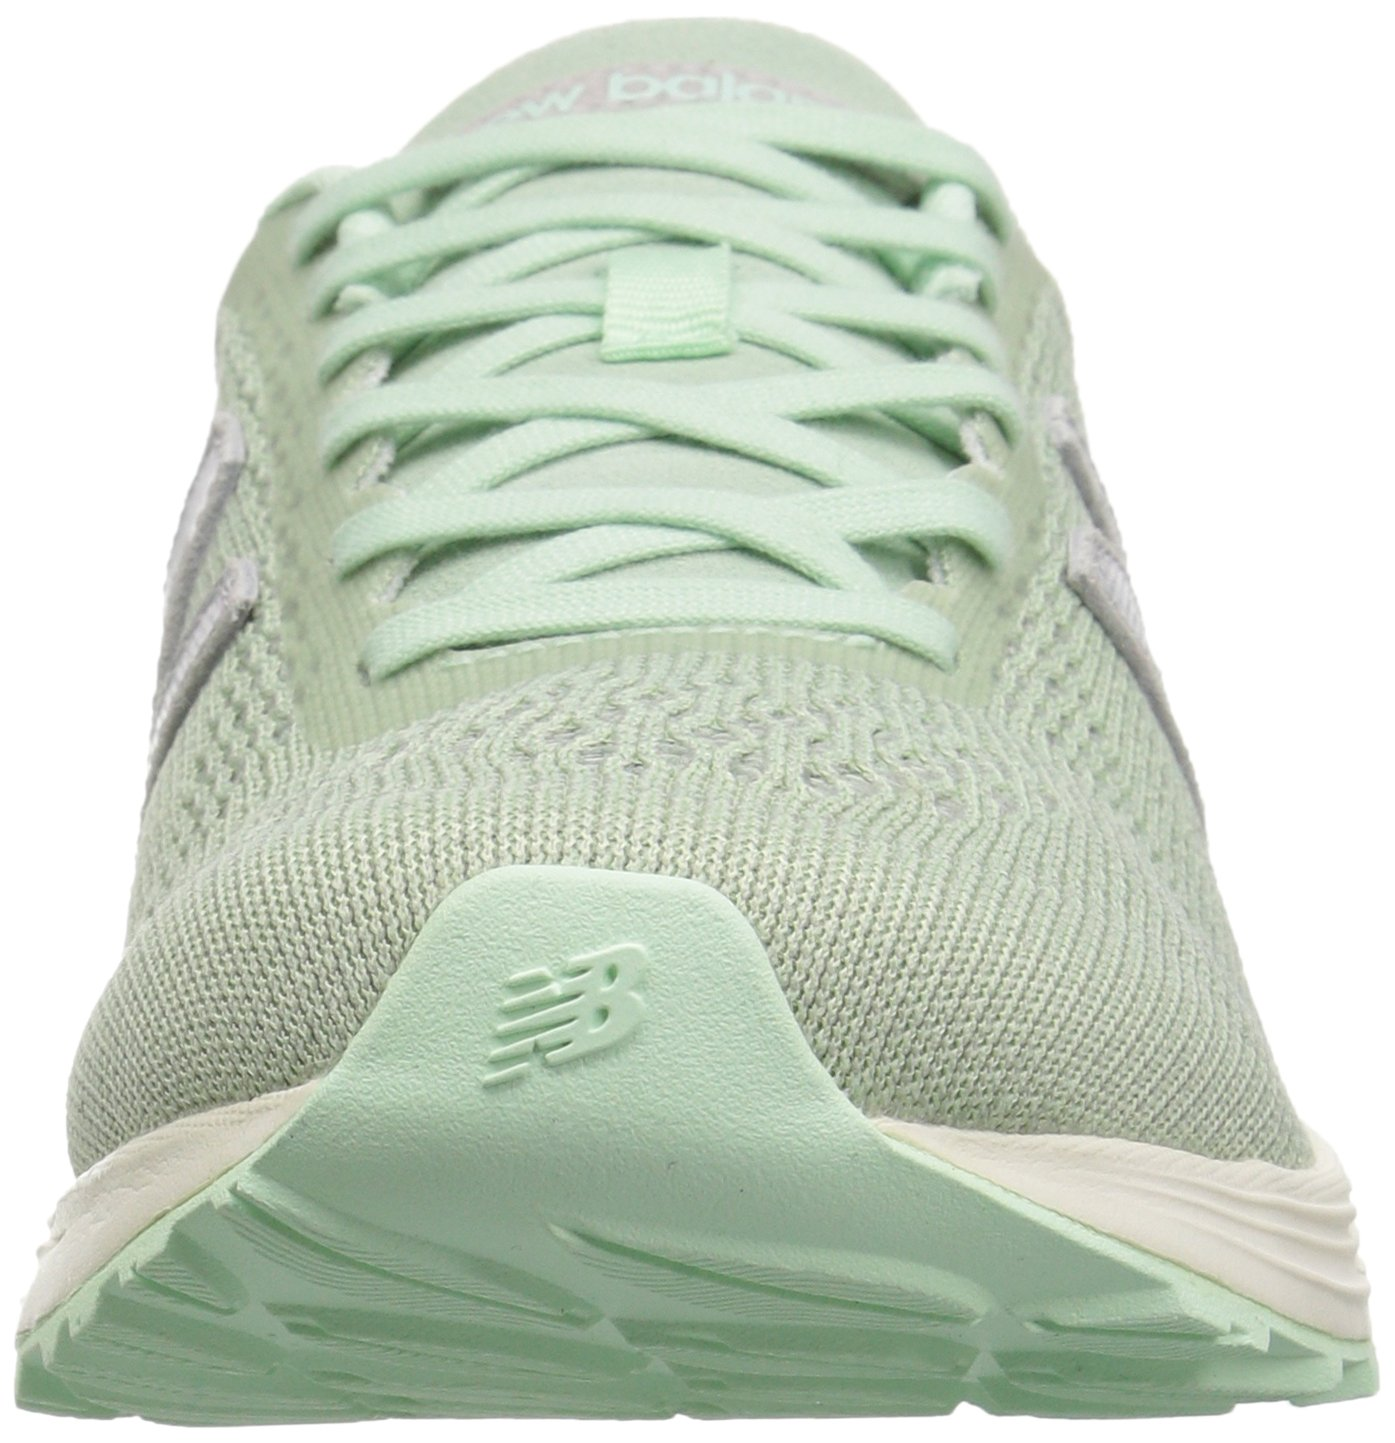 New Balance B06XSBCZ5S Women's Fresh Foam Arishi V1 Running Shoe B06XSBCZ5S Balance 9.5 D US|Seafoam/Overcast 293940